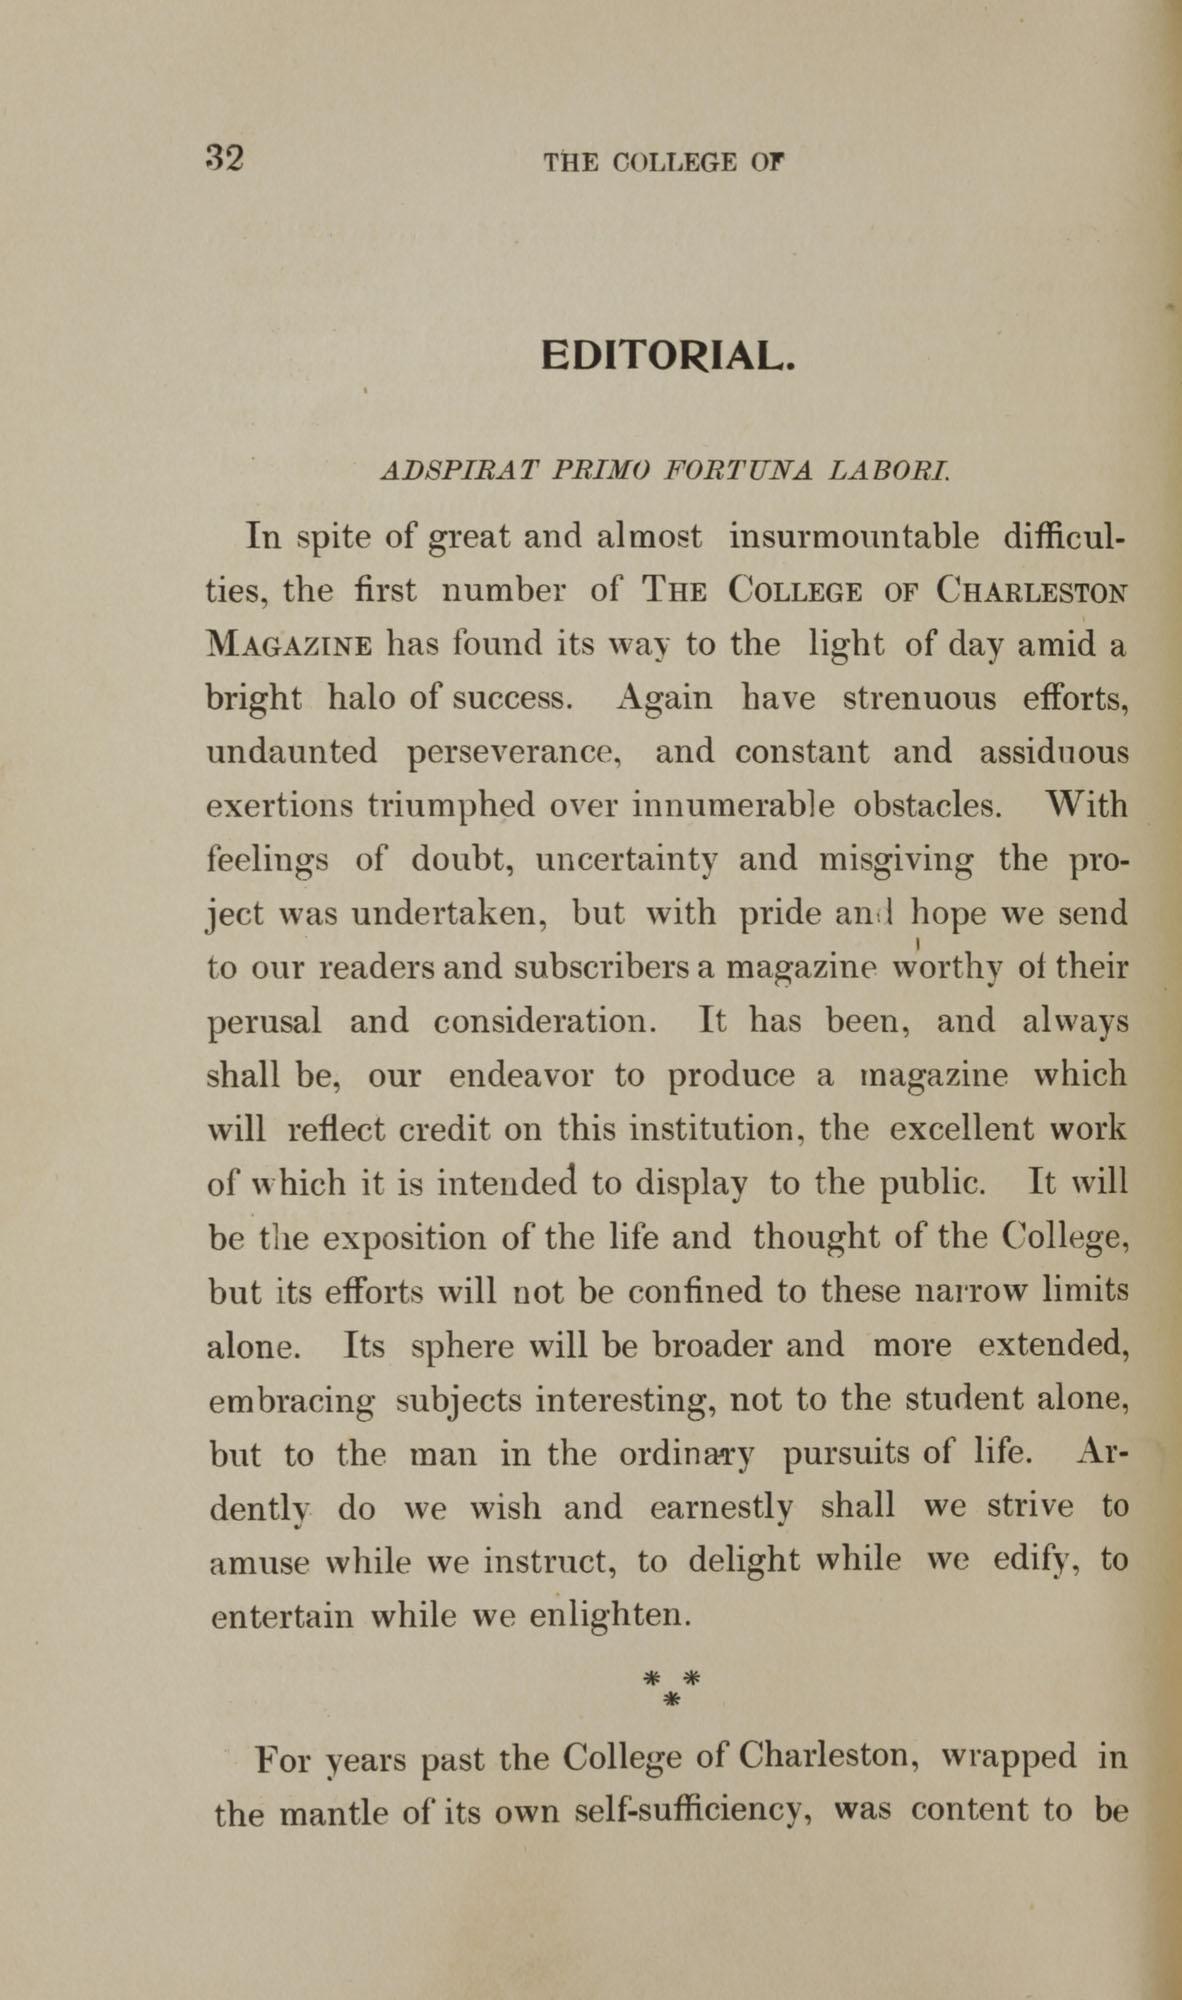 College of Charleston Magazine, 1898, Vol I. No. 1, page 32